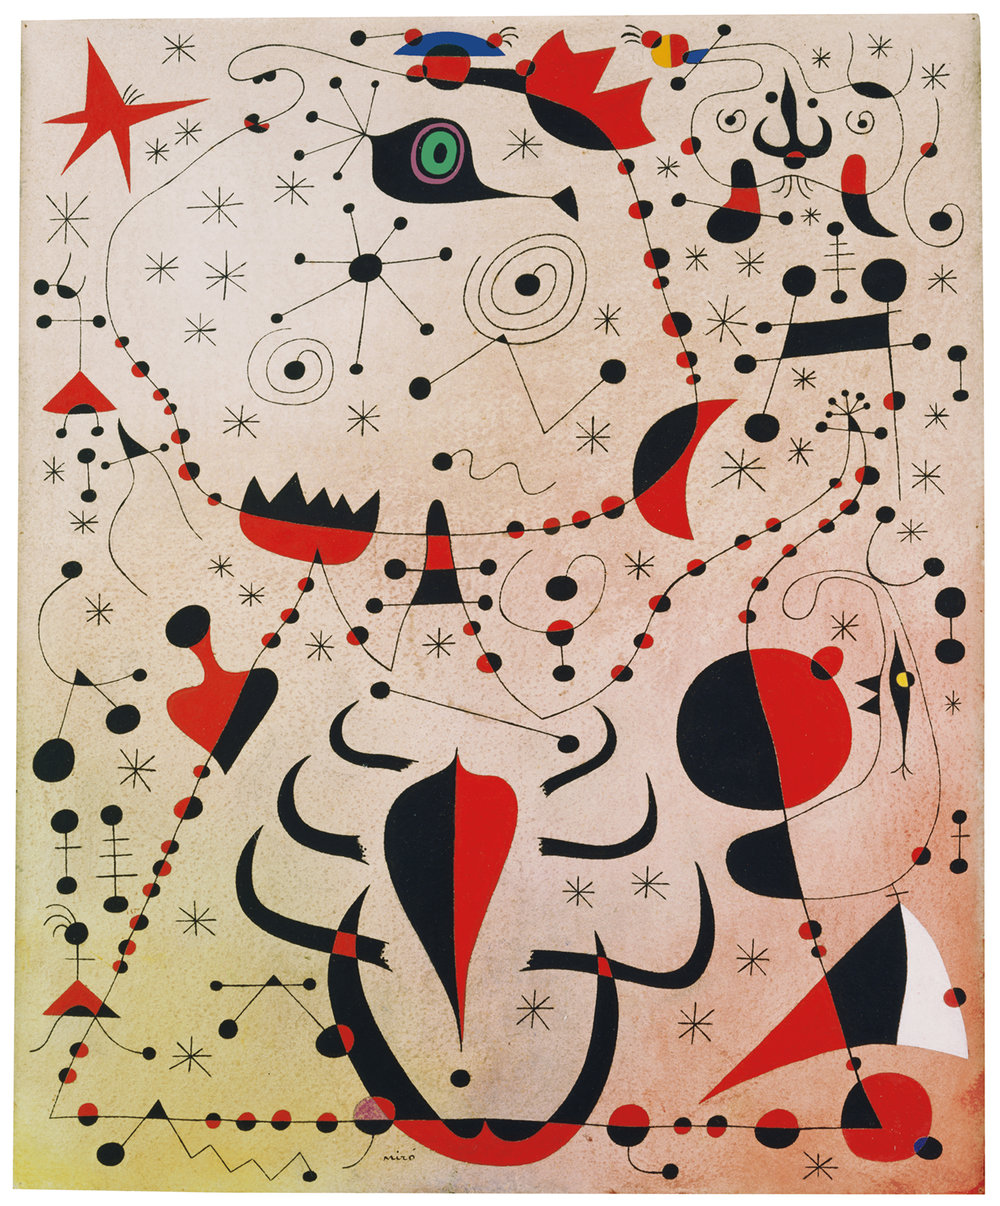 Miro - The Pink Dusk, no 649